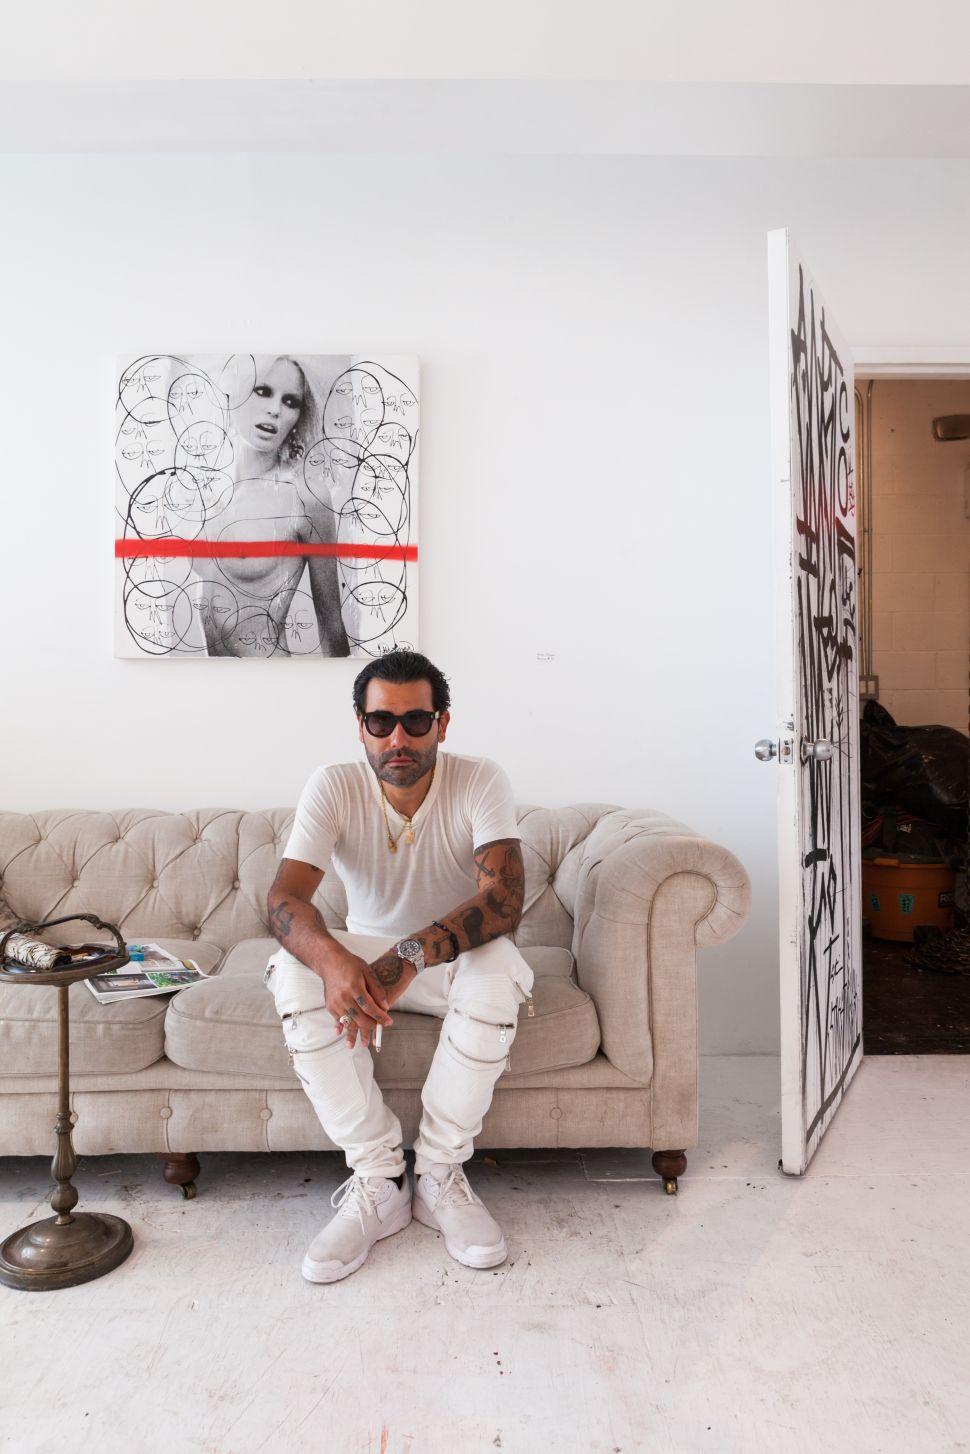 Meet the Graffiti Artist Shaking Up the Fashion World